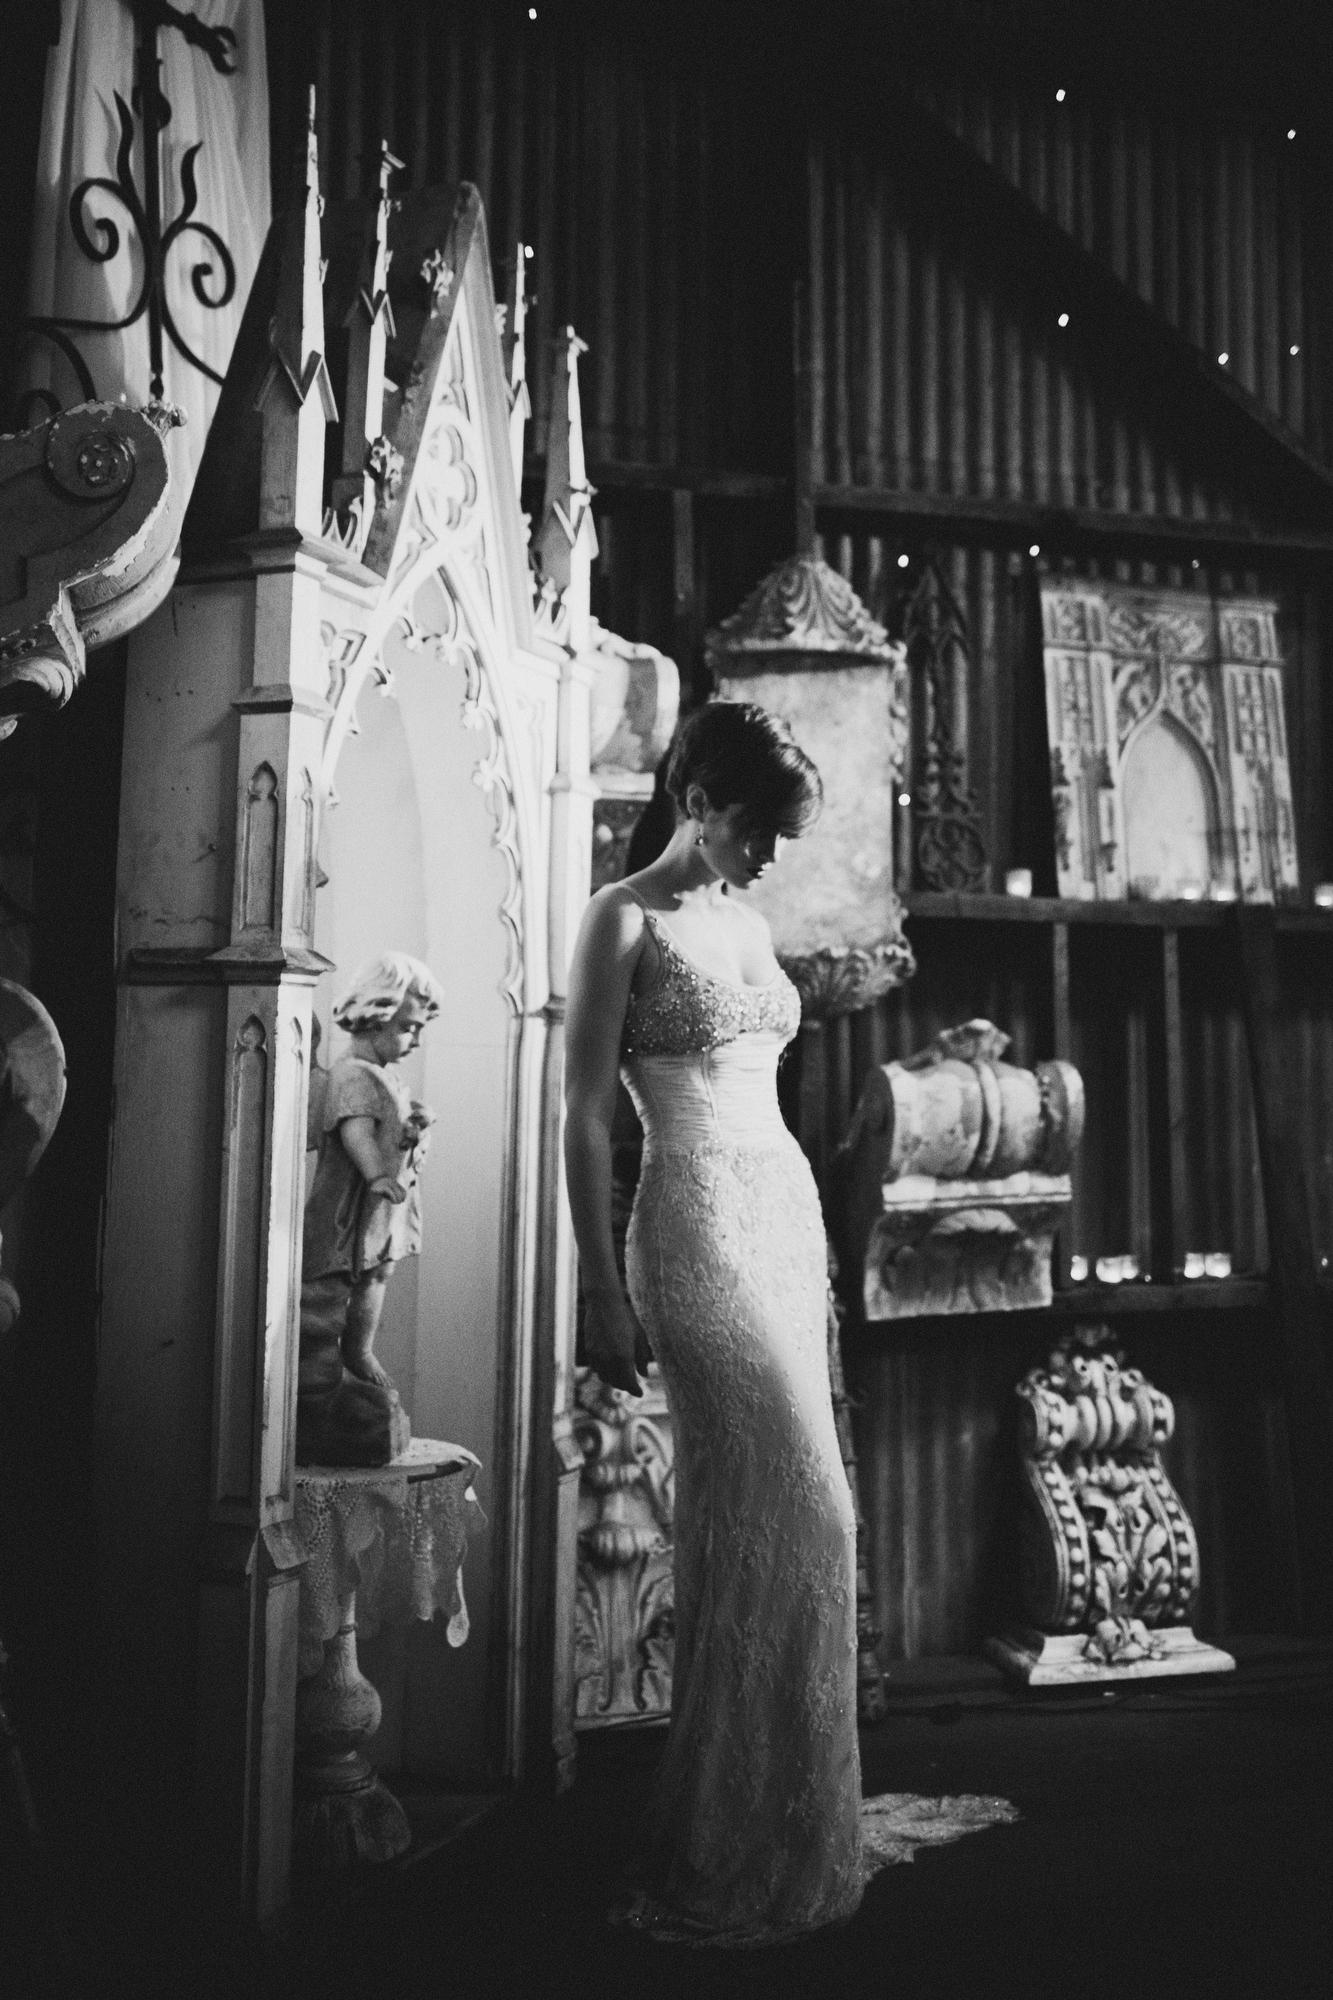 jennifer-skog-bridal-fashion-photographer-lifestyle-0003.jpg